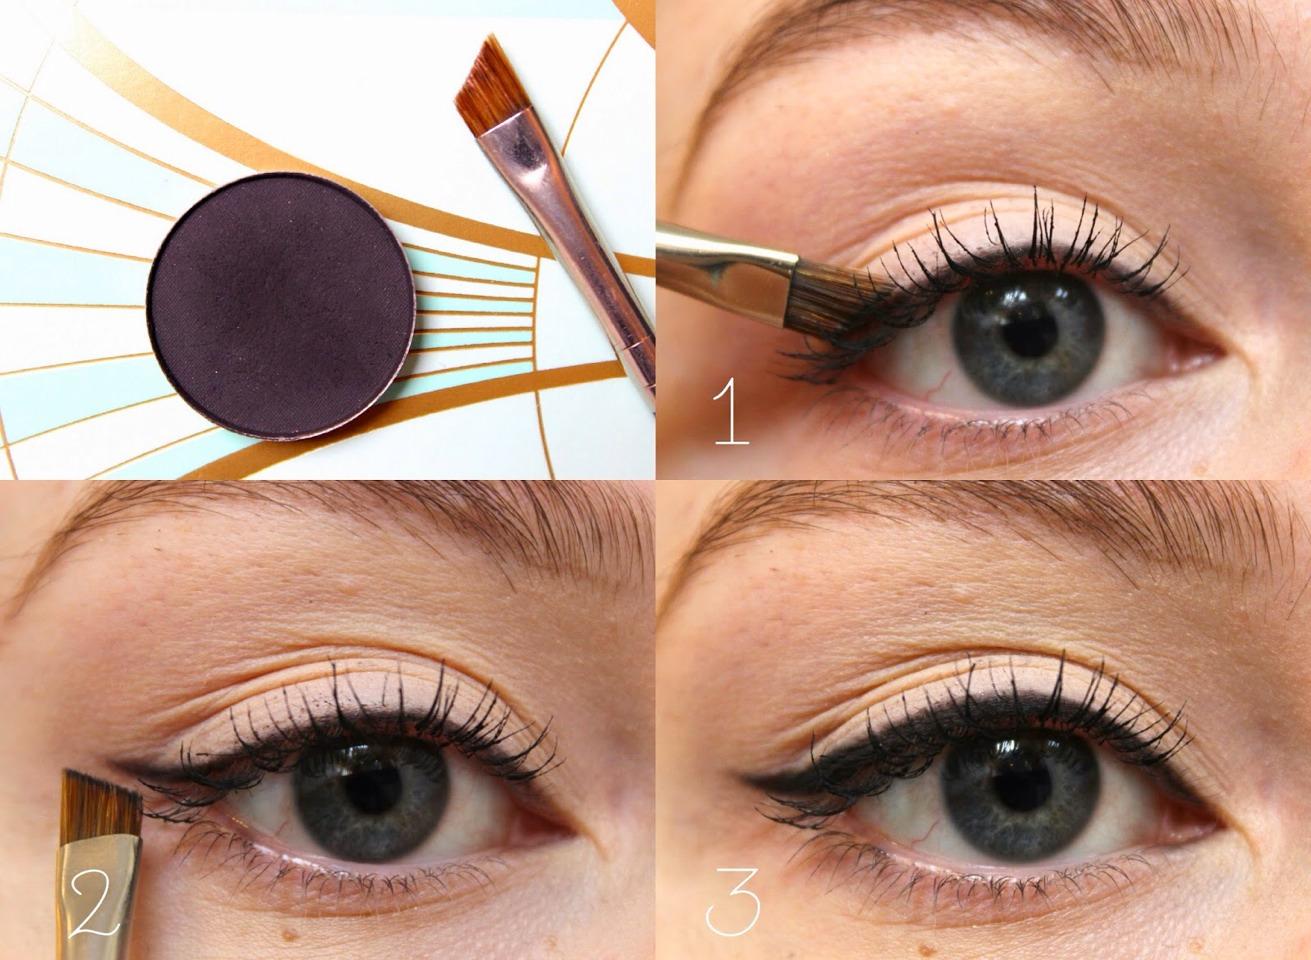 Applying eye makeup for beginners